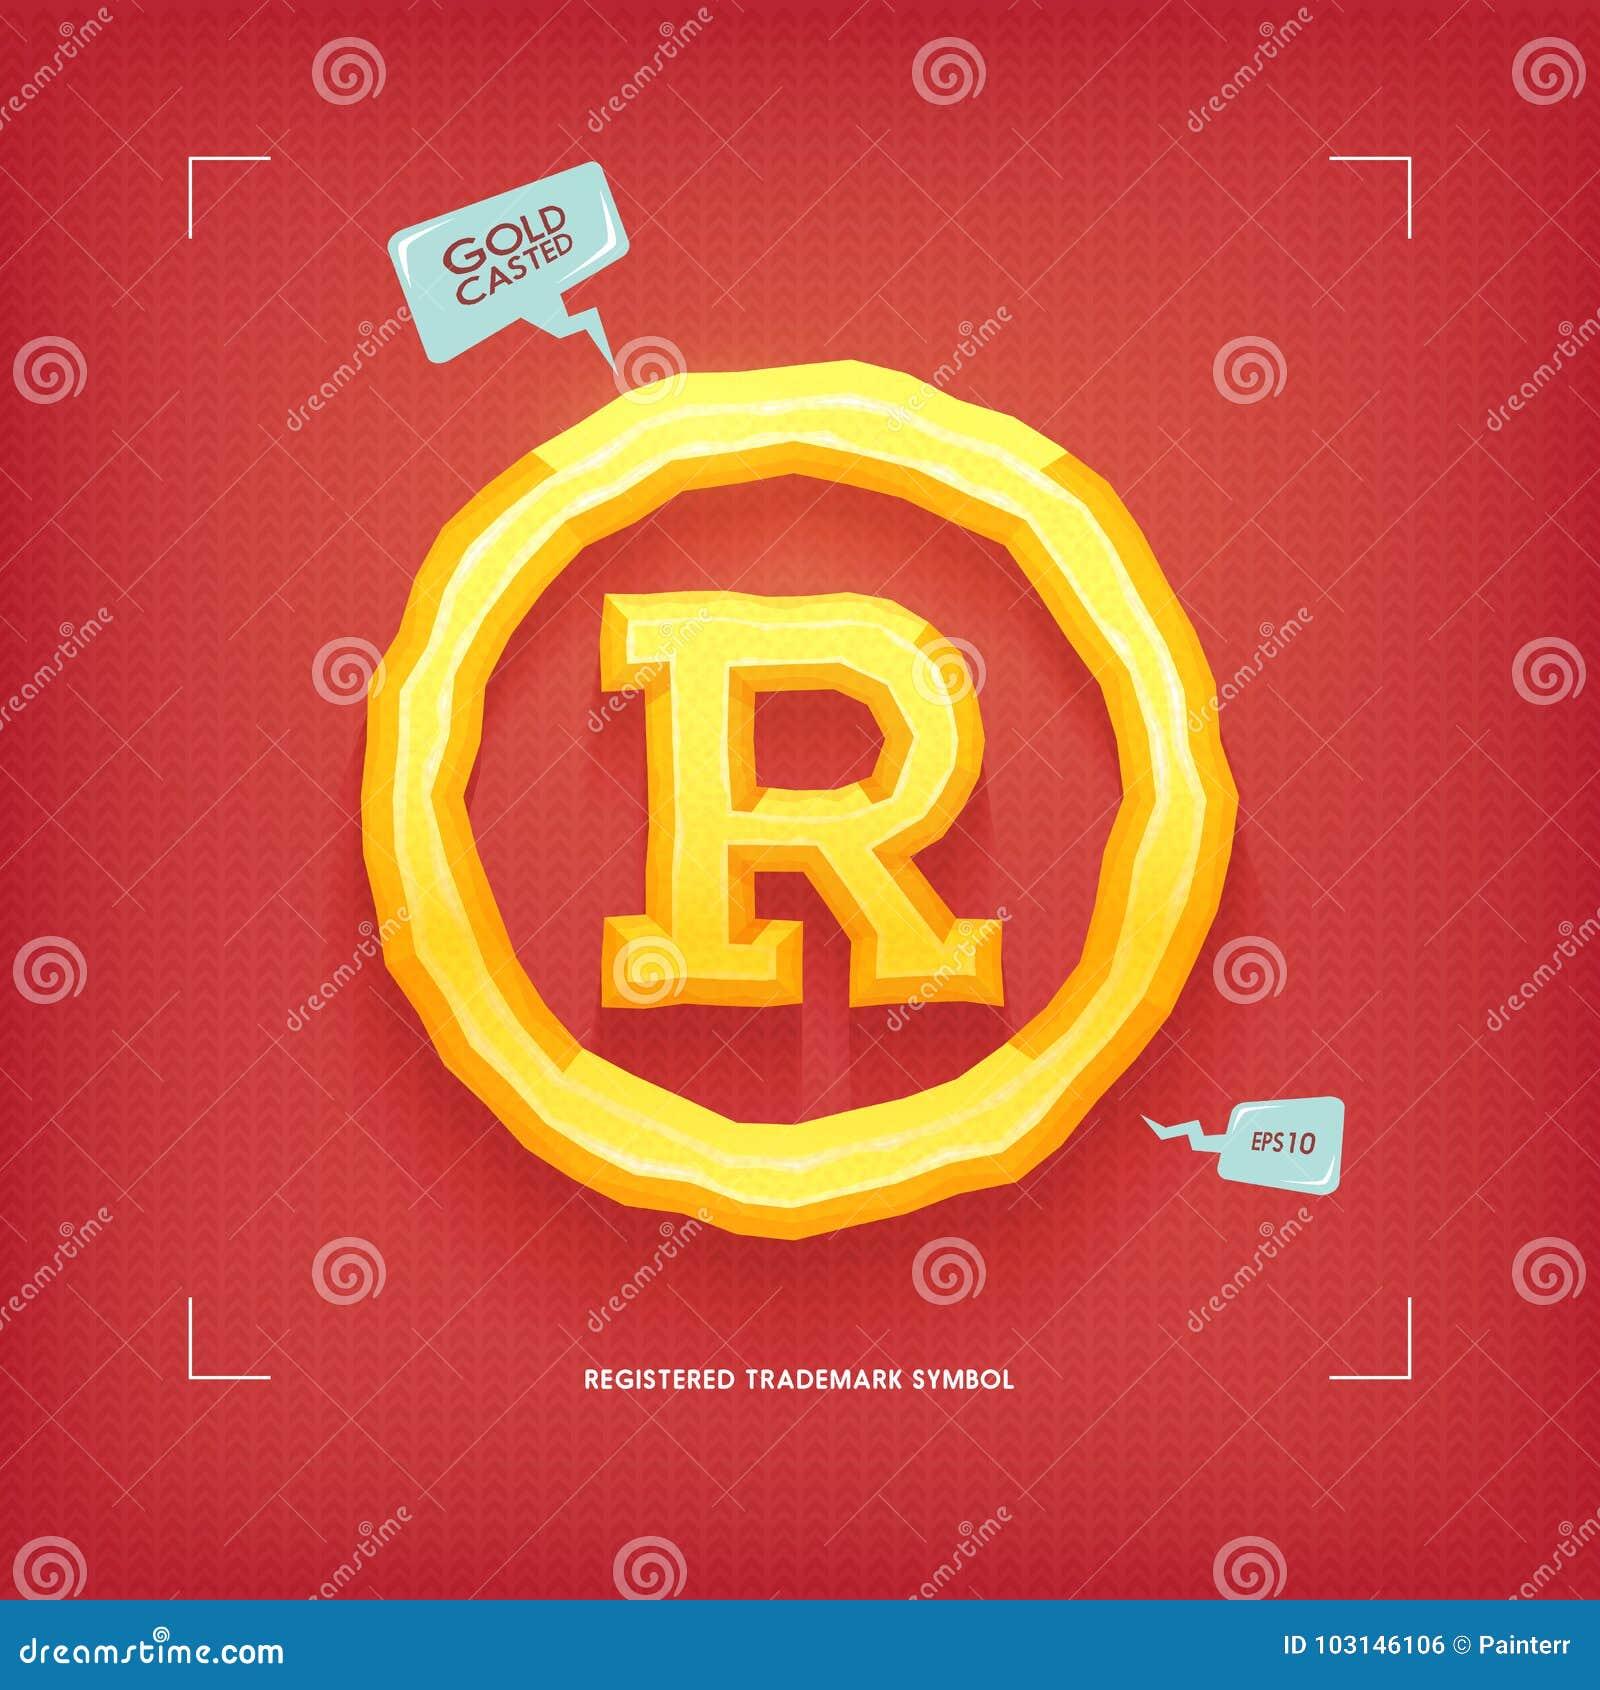 Registered Trademark Symbol Golden Jewel Typeface Element Gold